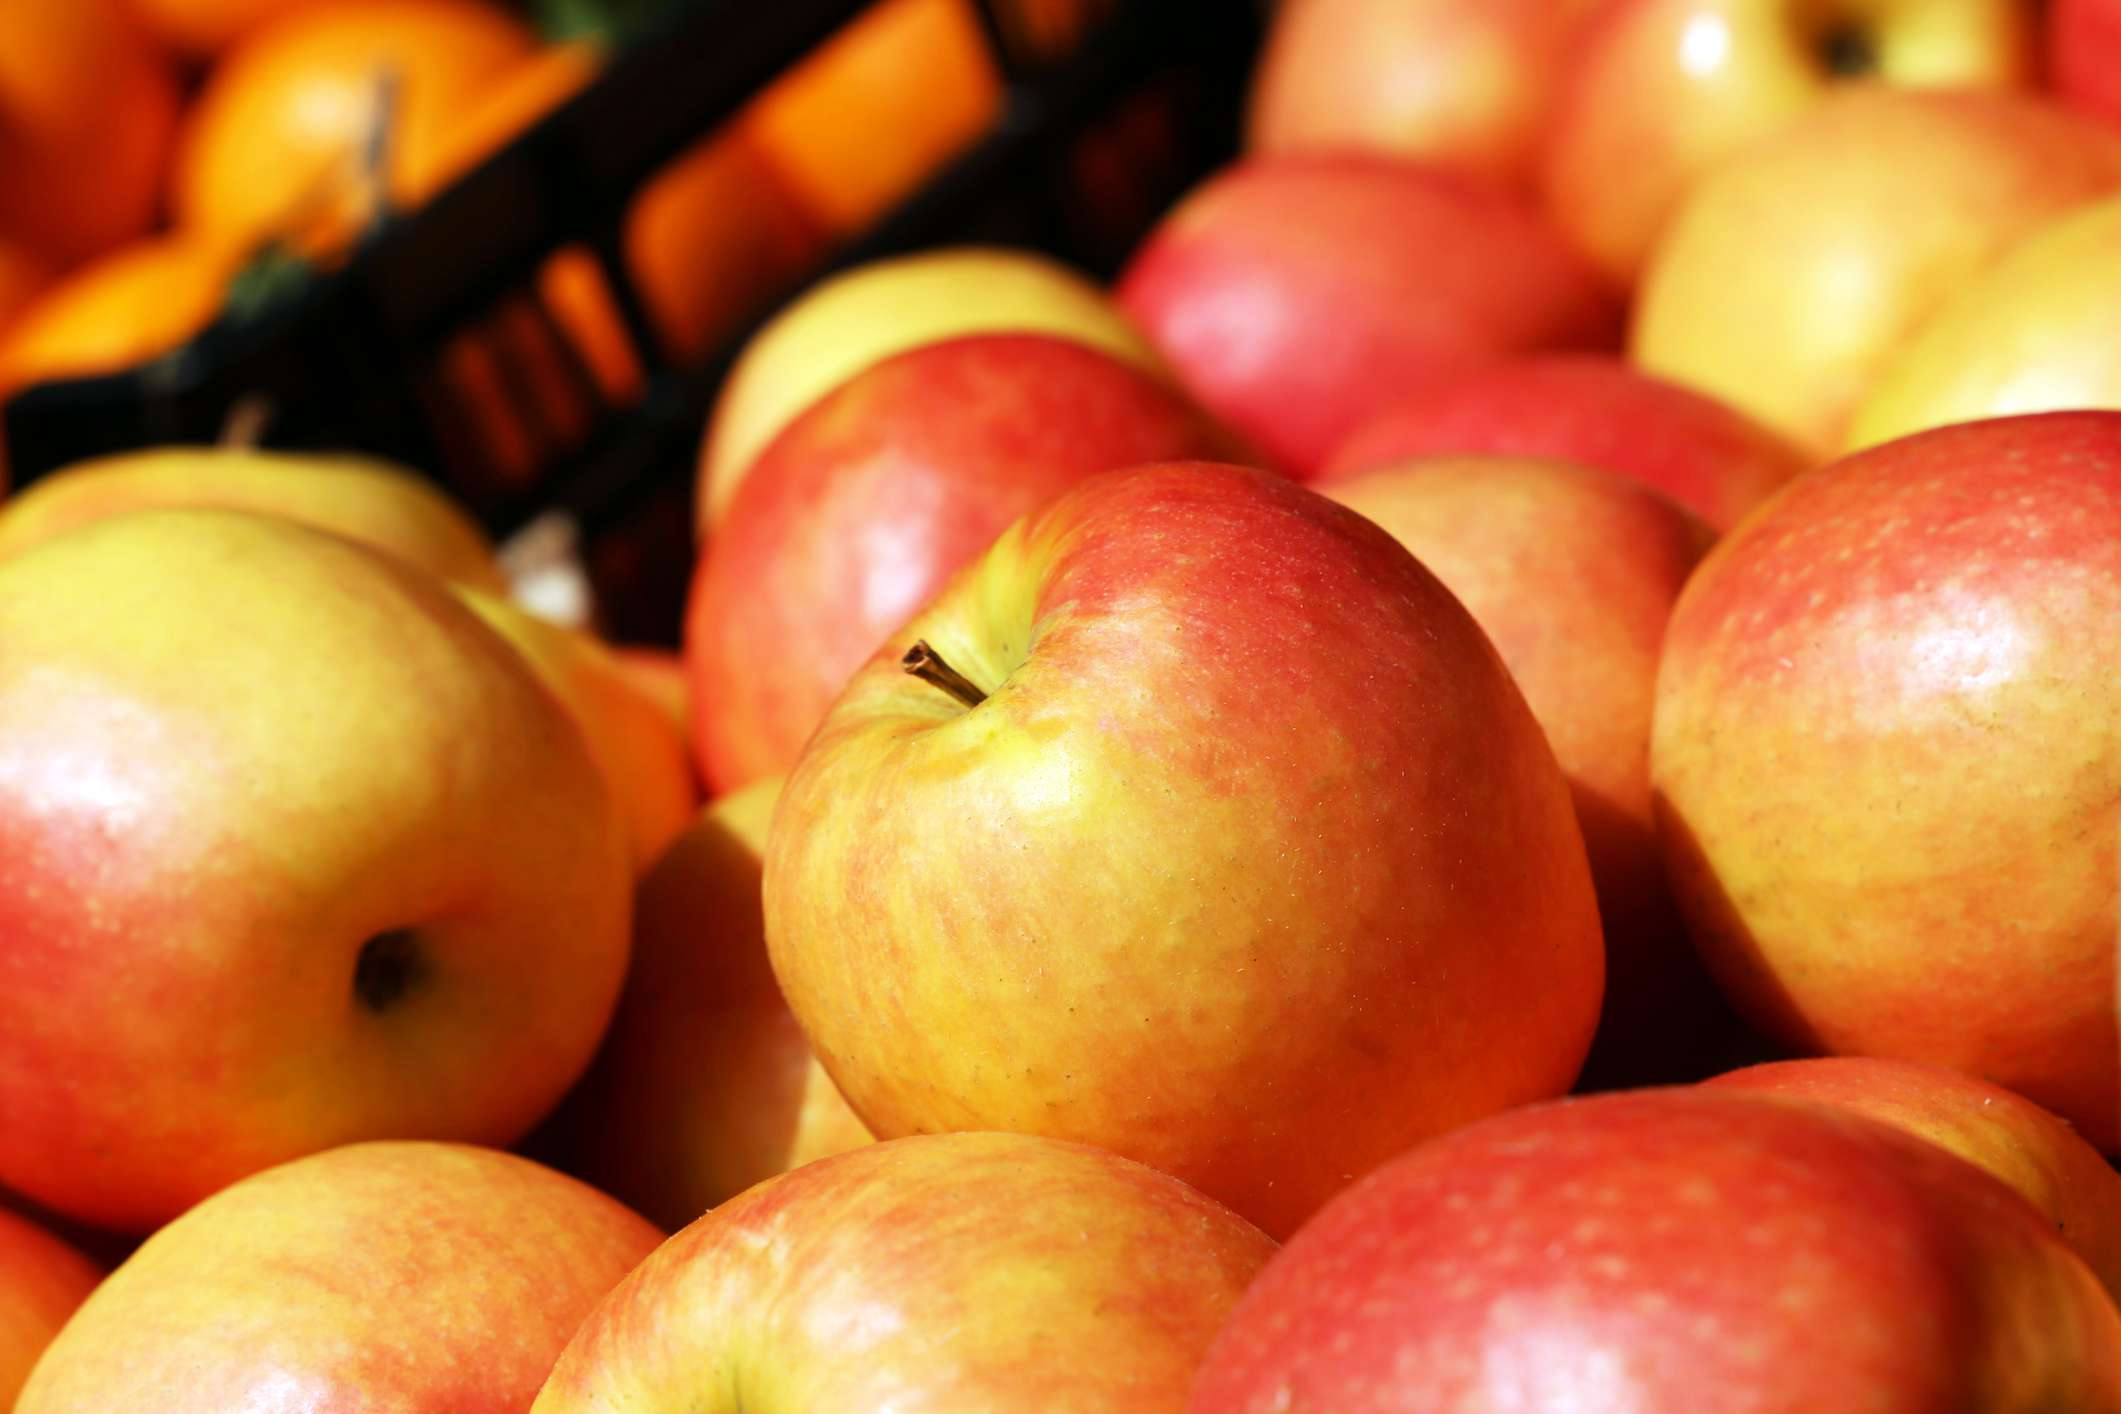 Northern Spy Apples